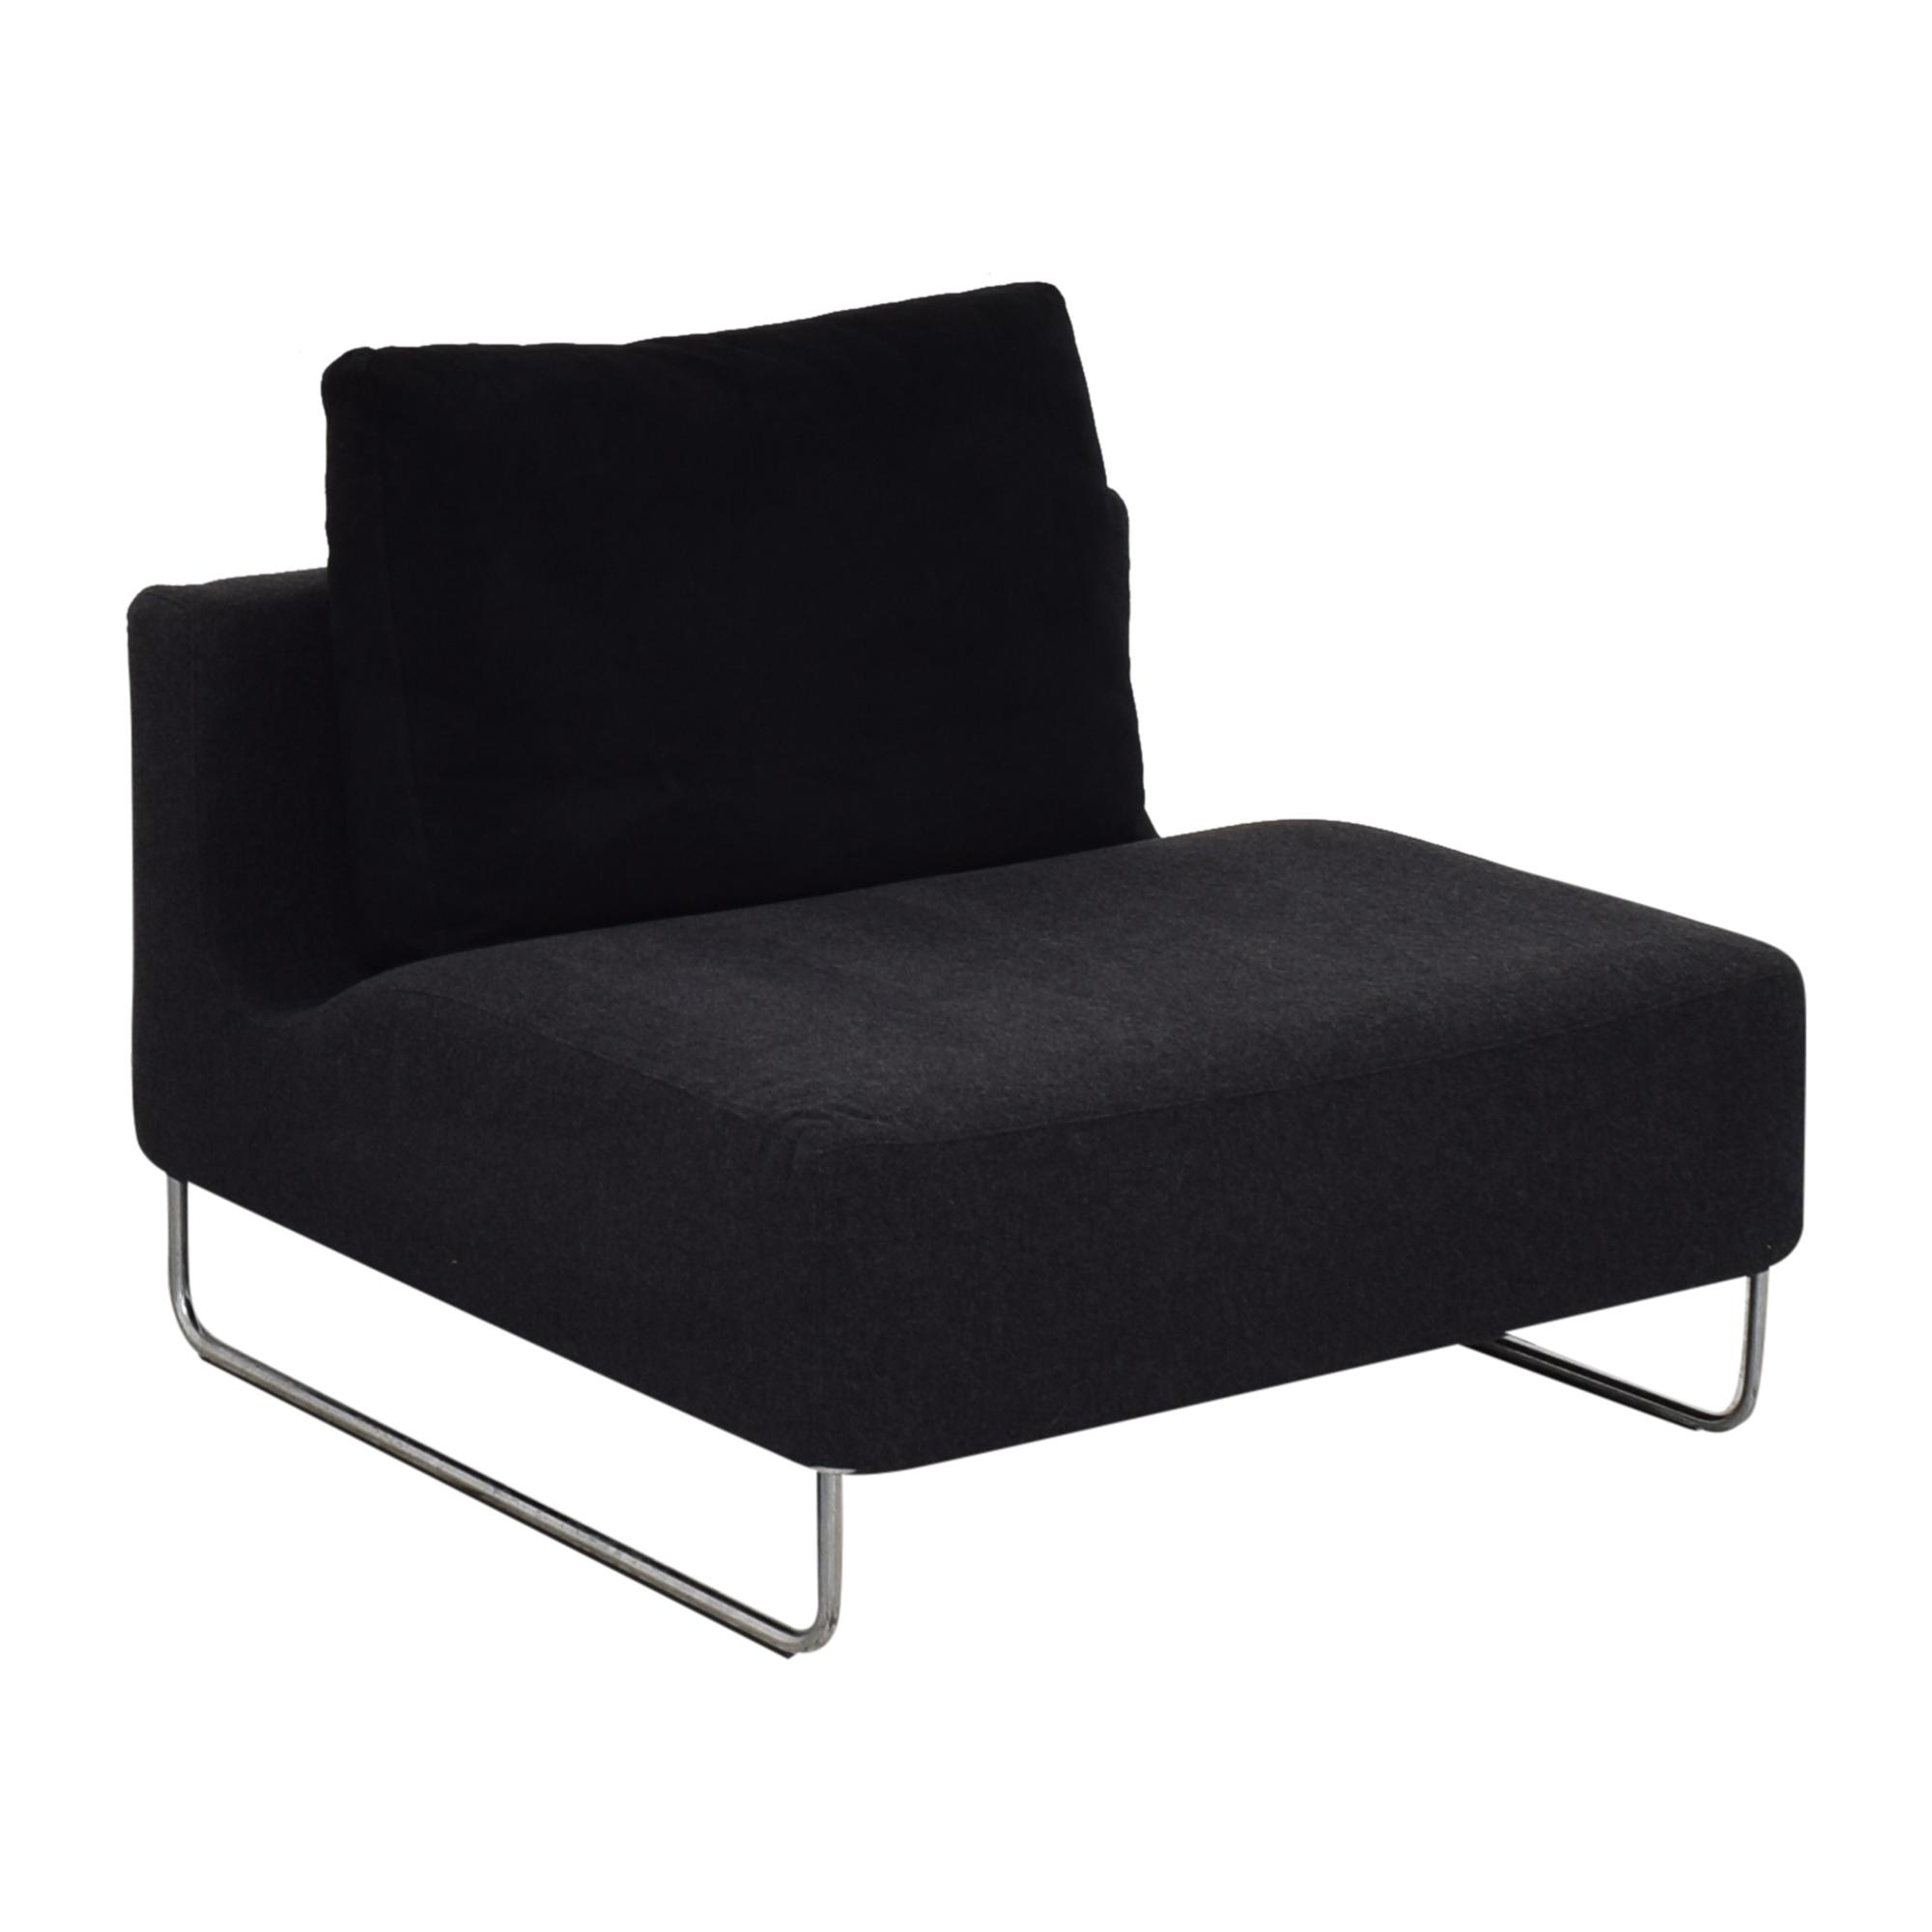 Bensen Bensen Canyon Lounge Chair price